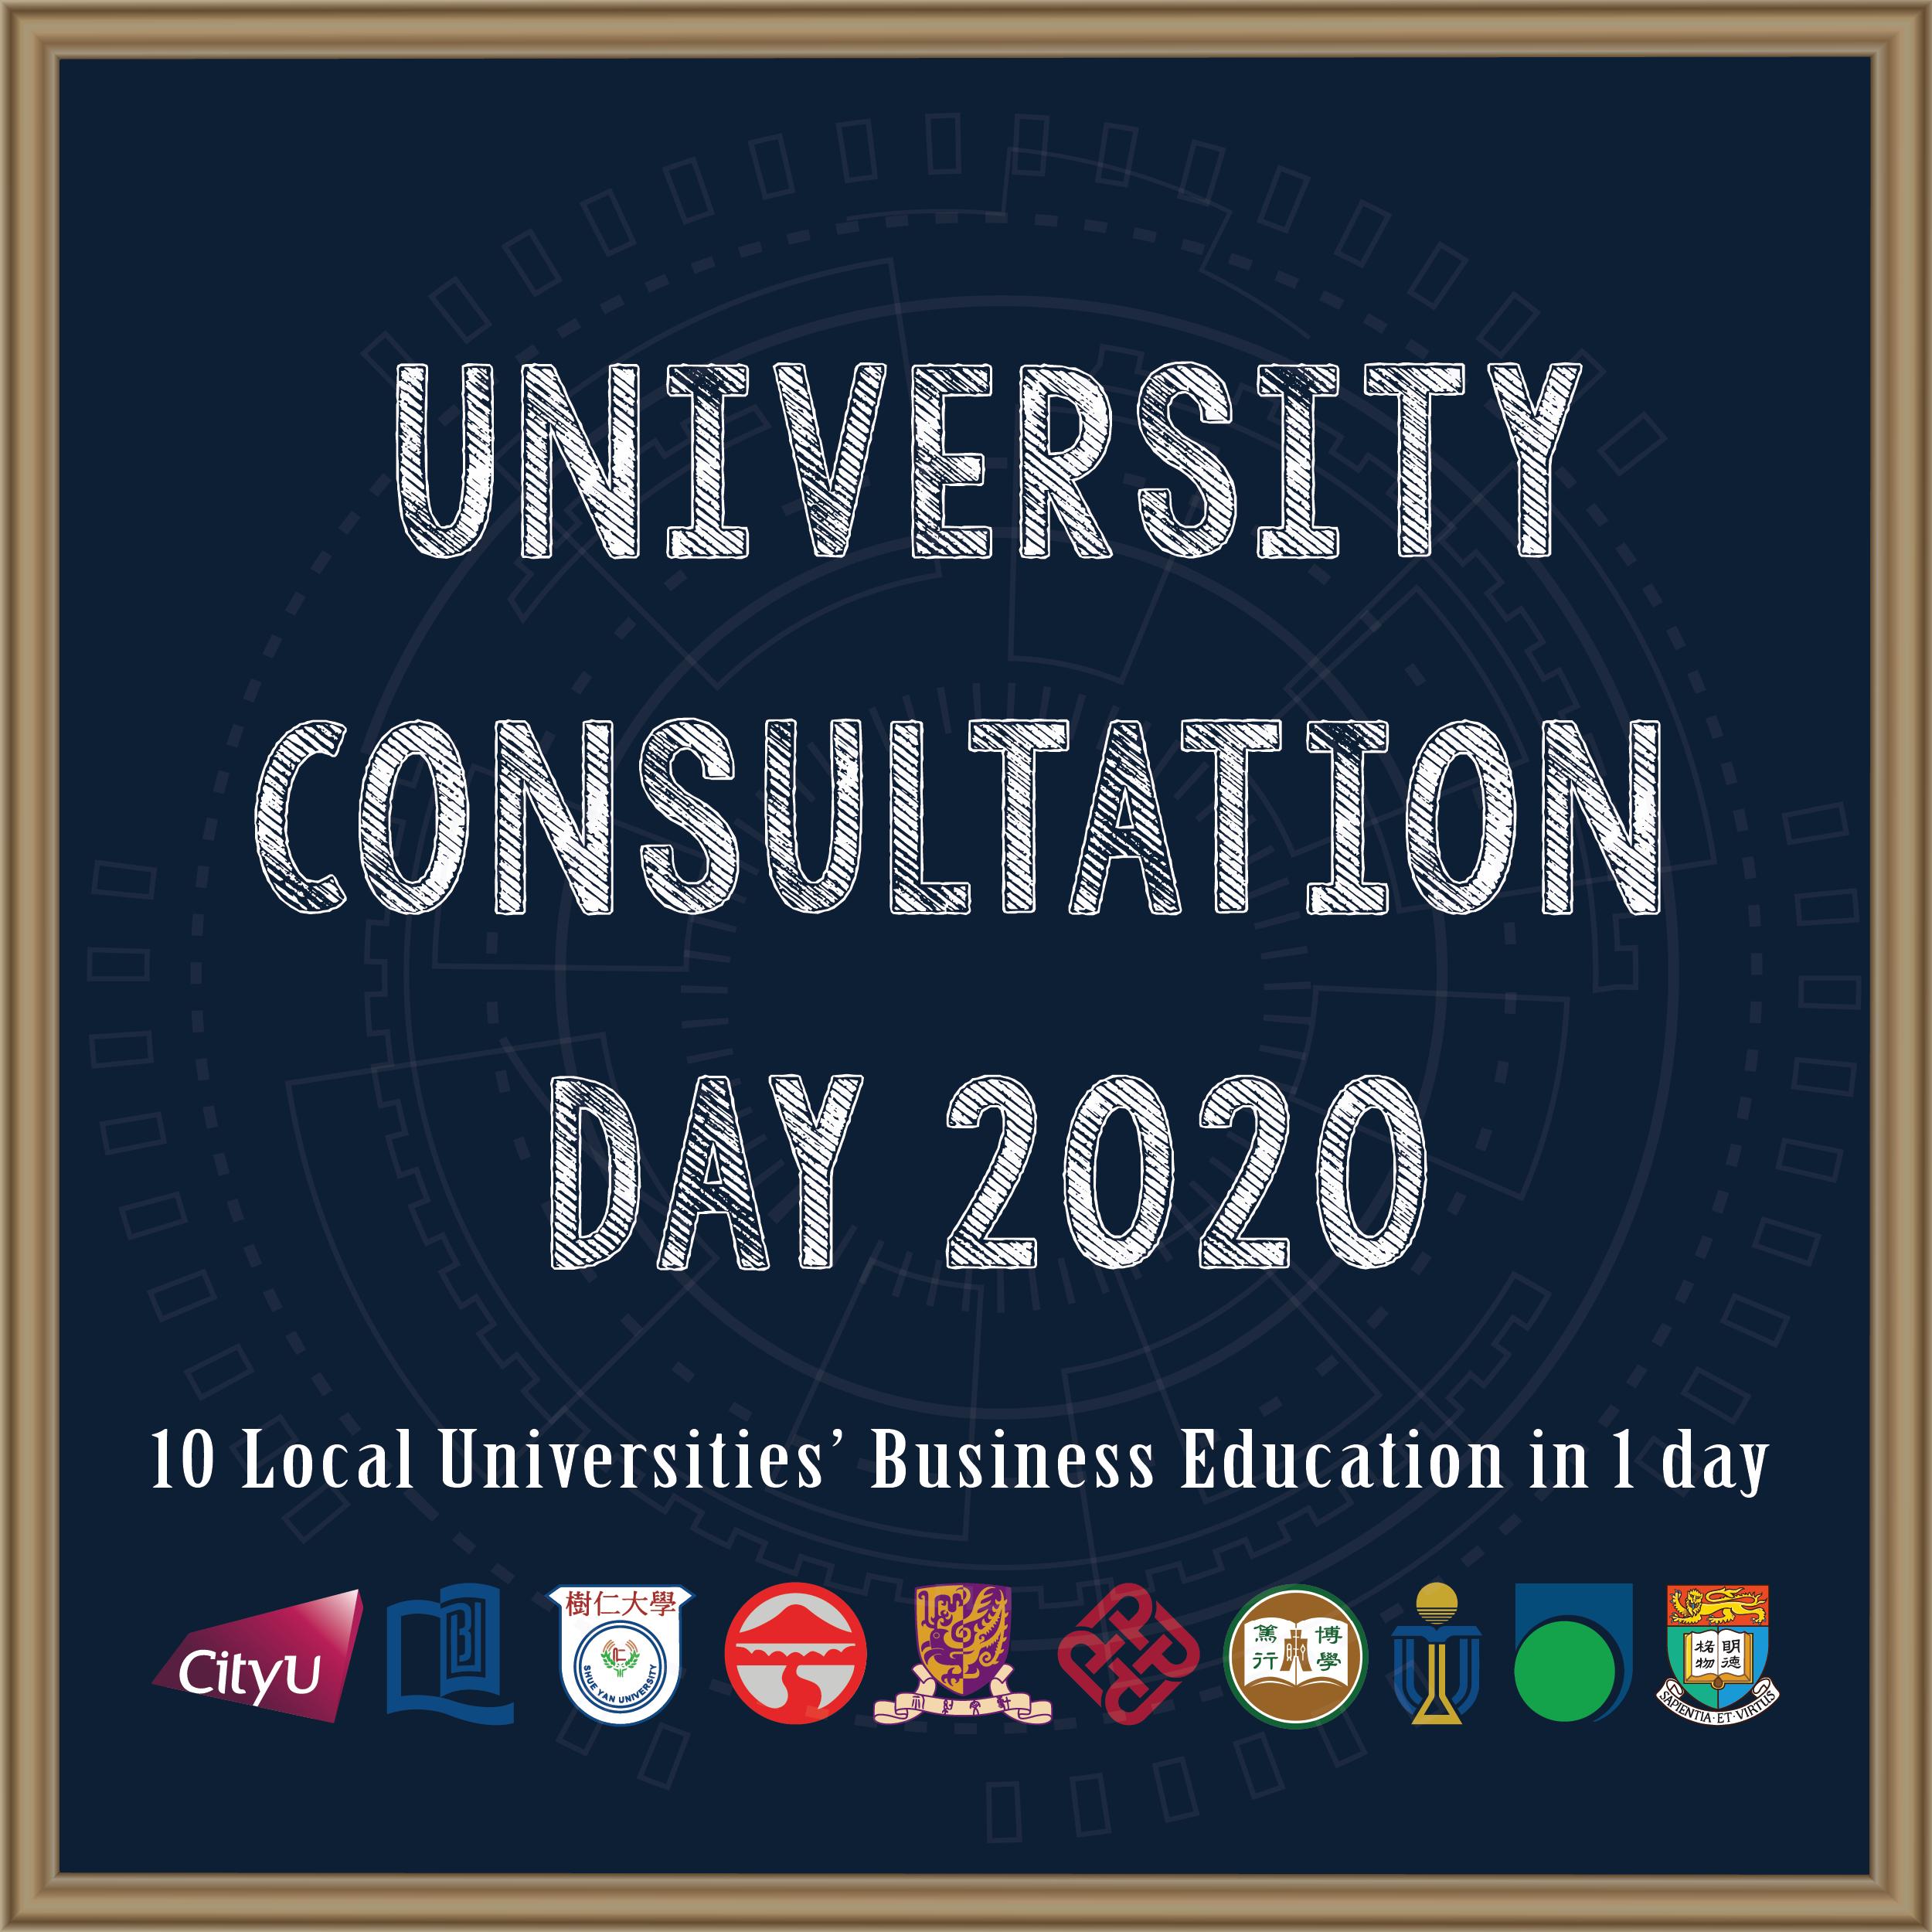 University Consultation Day 2020